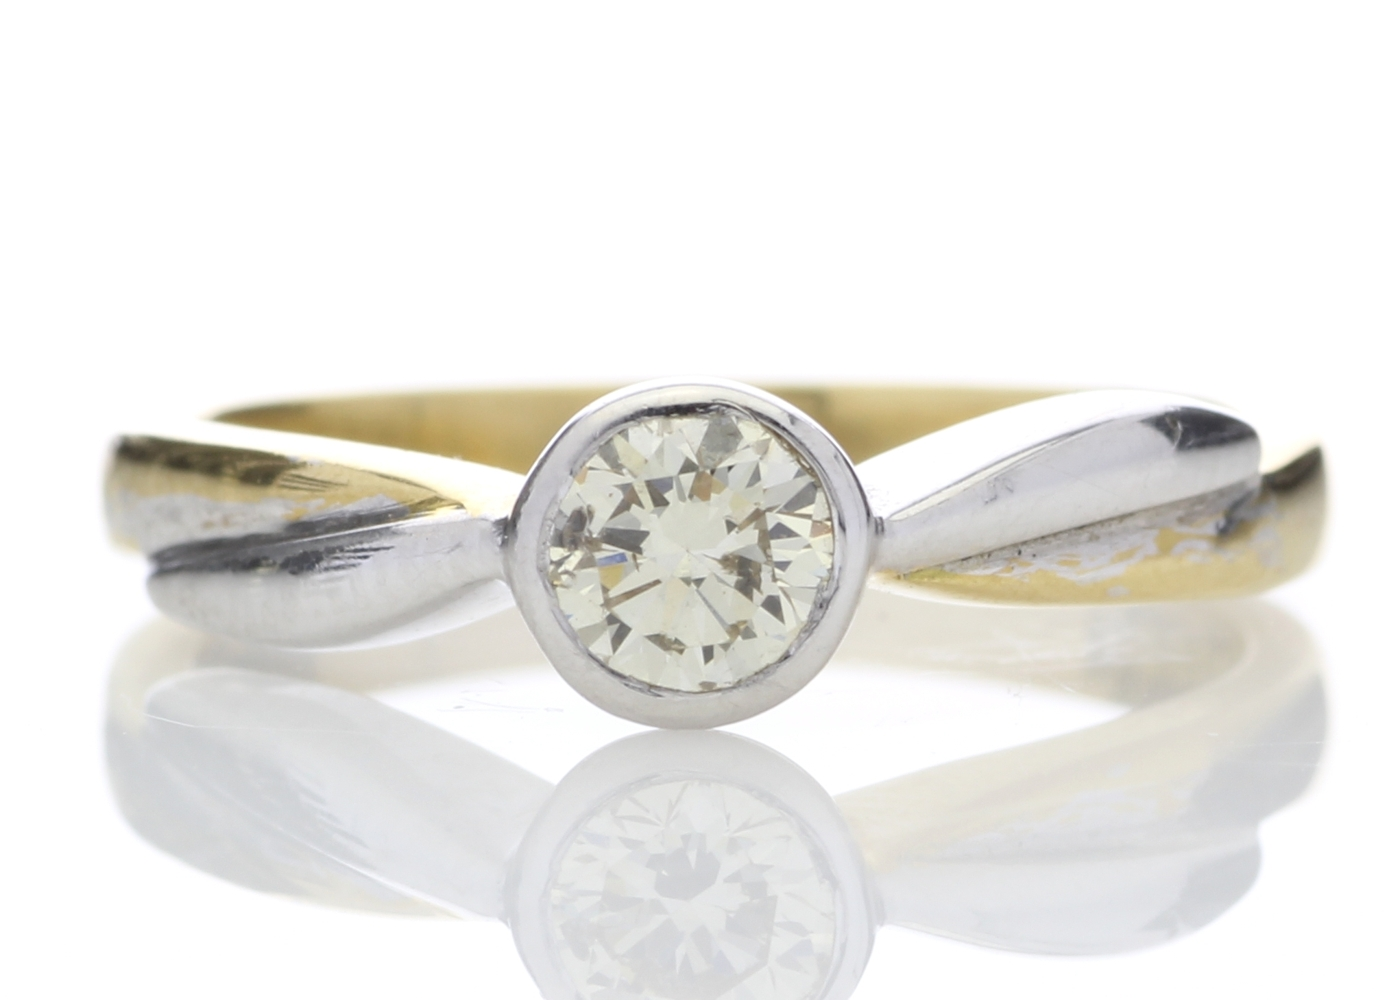 Lot 2 - 18ct Single Stone Rub Over Set Diamond Ring 0.45 Carats